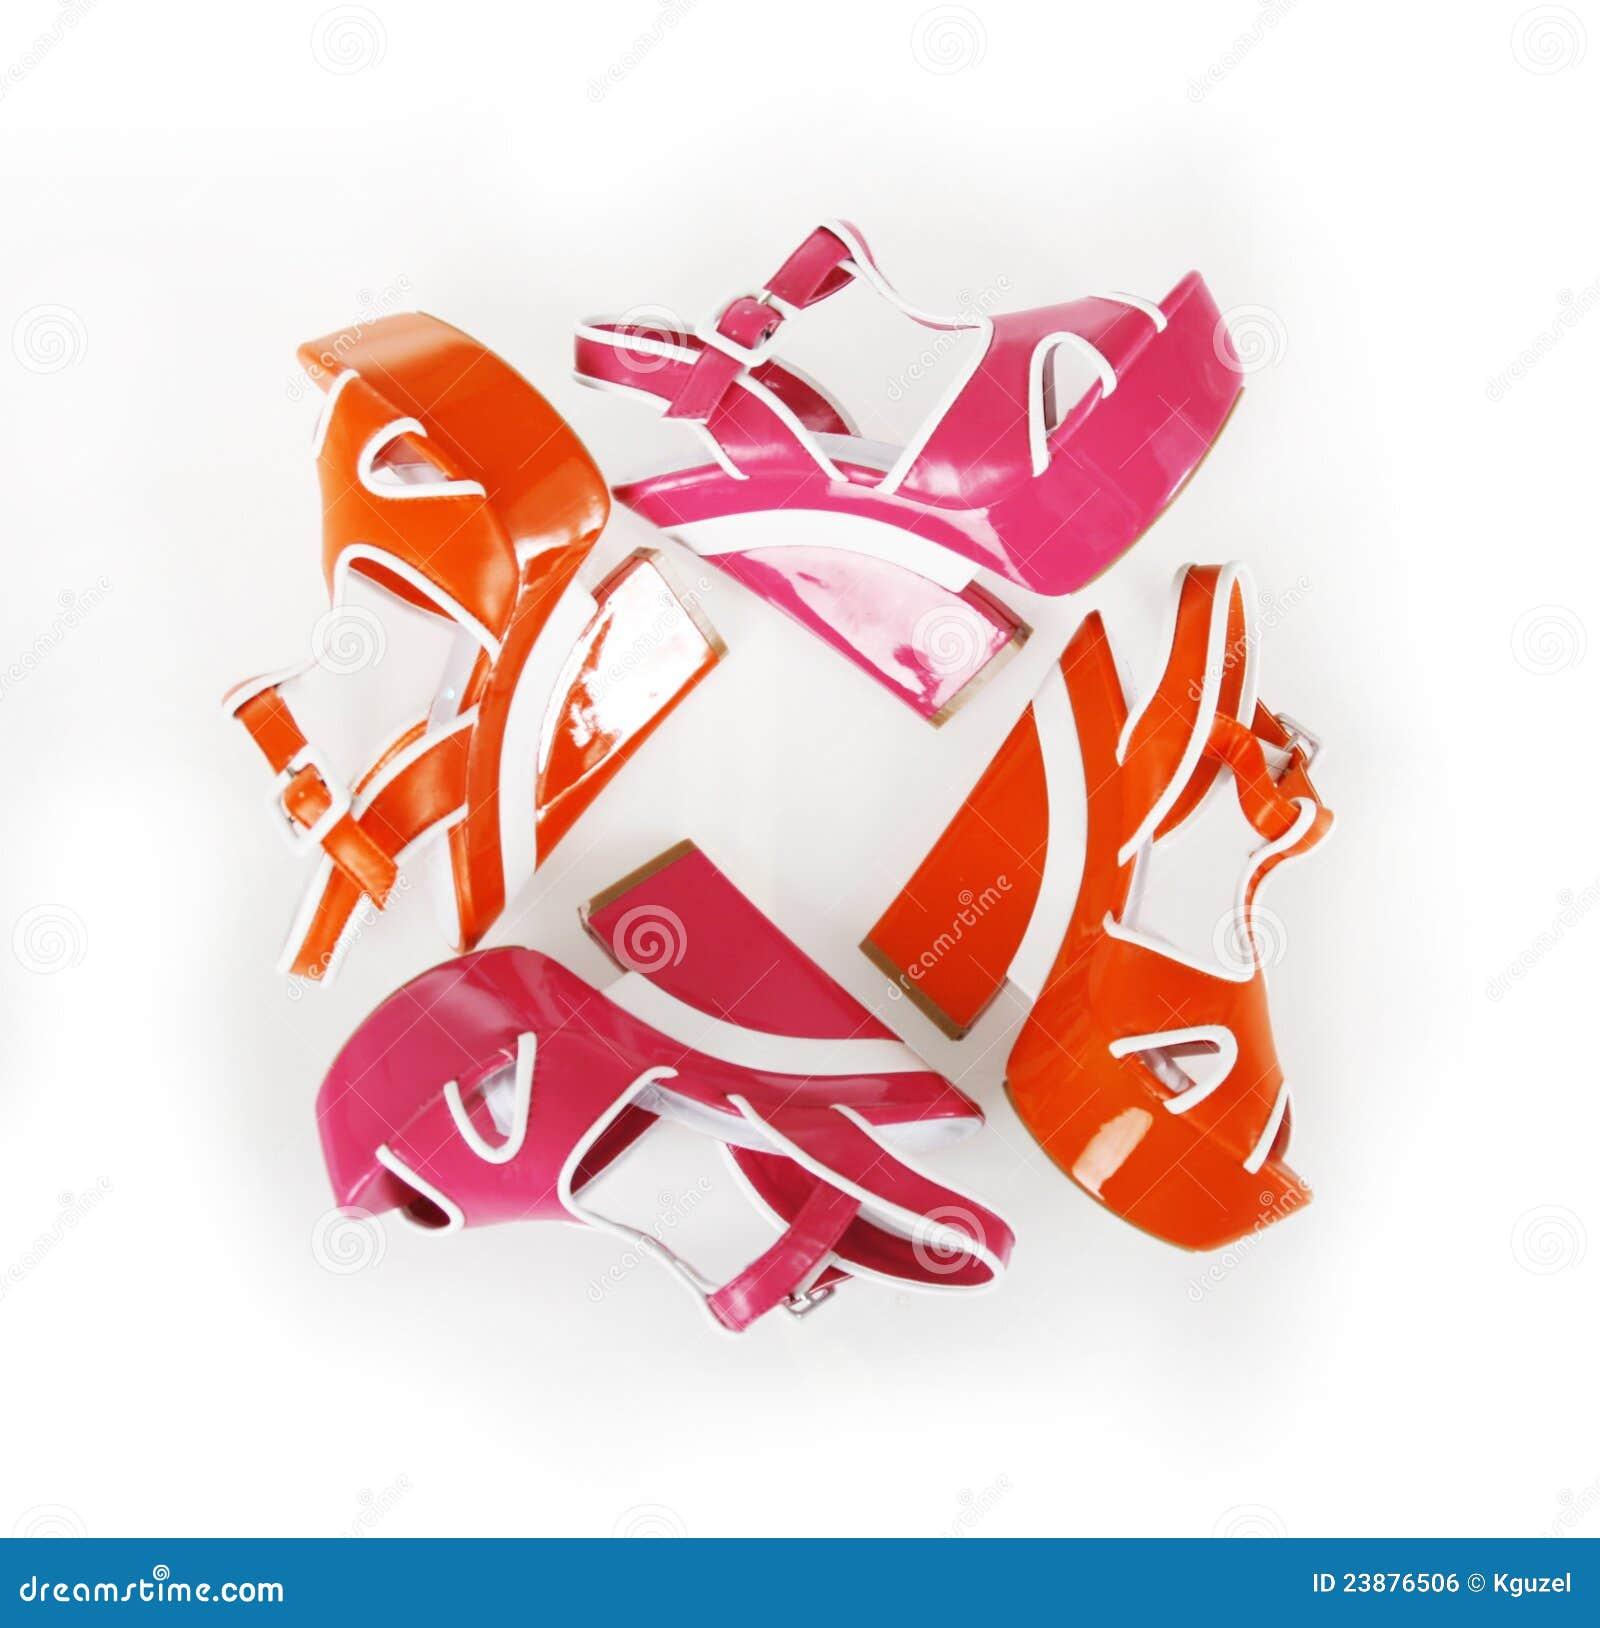 Orange and fuchsia colors platform shoes